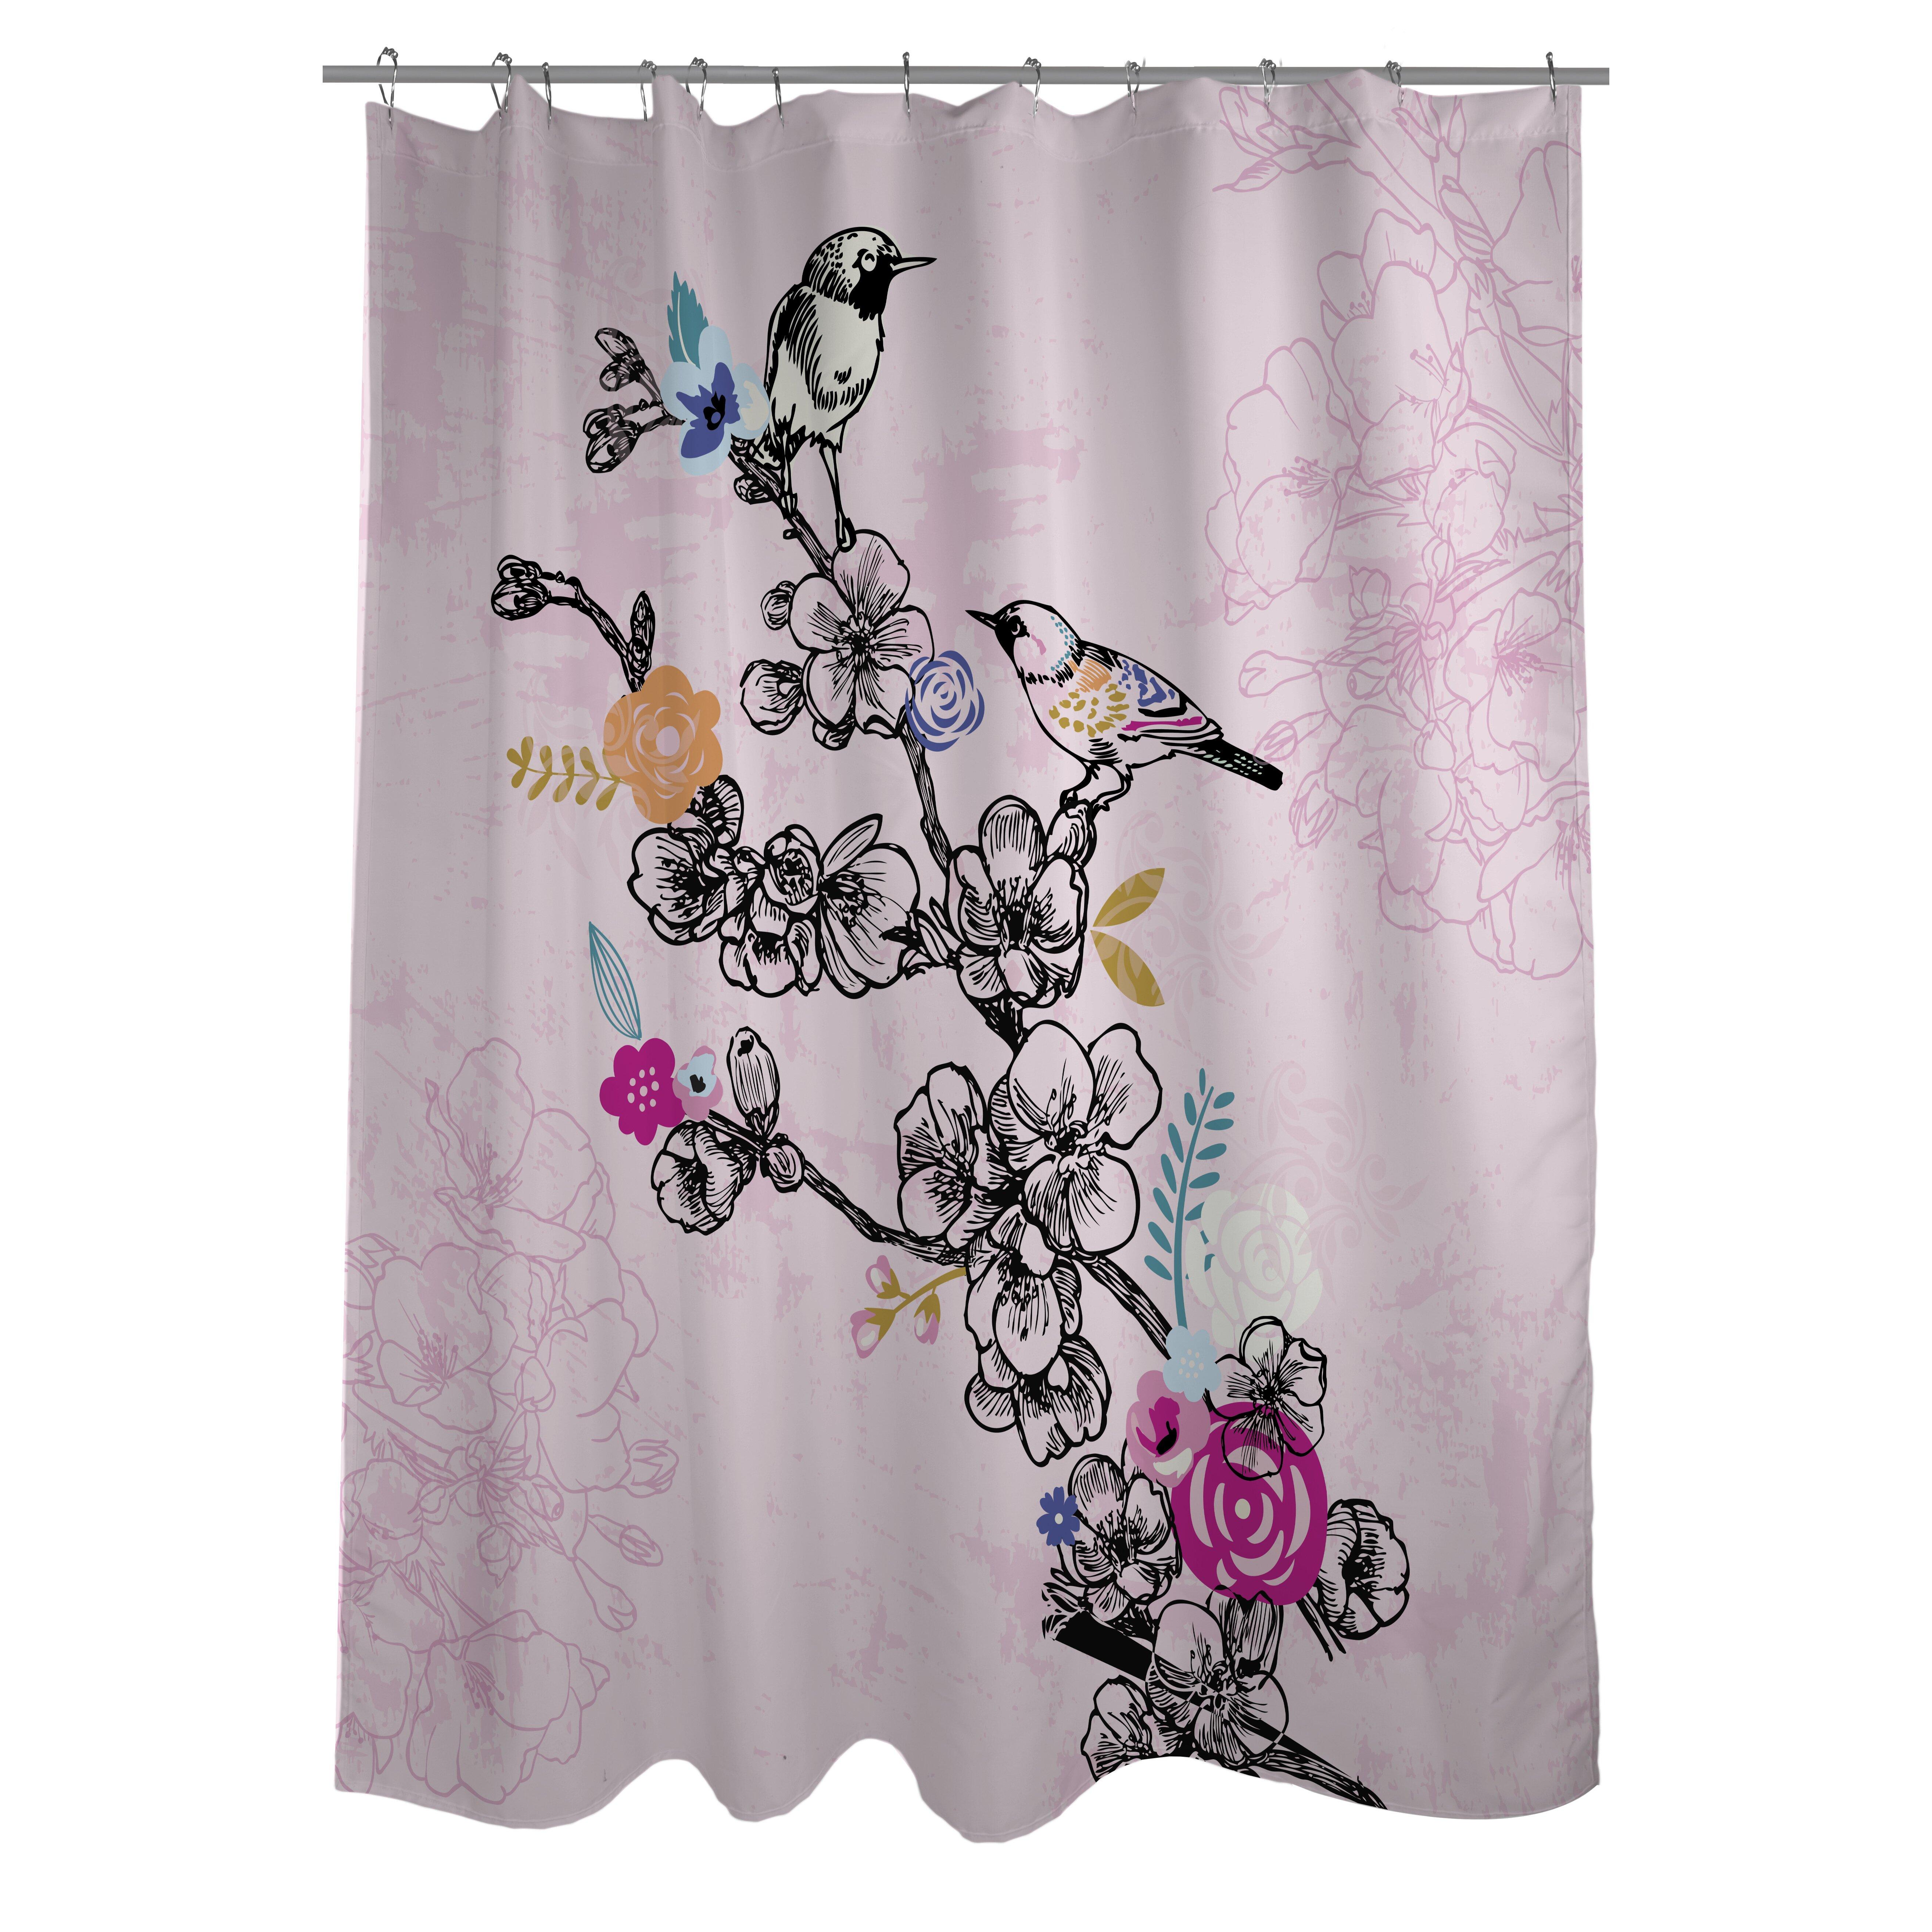 Birds Shower Curtain Wayfair